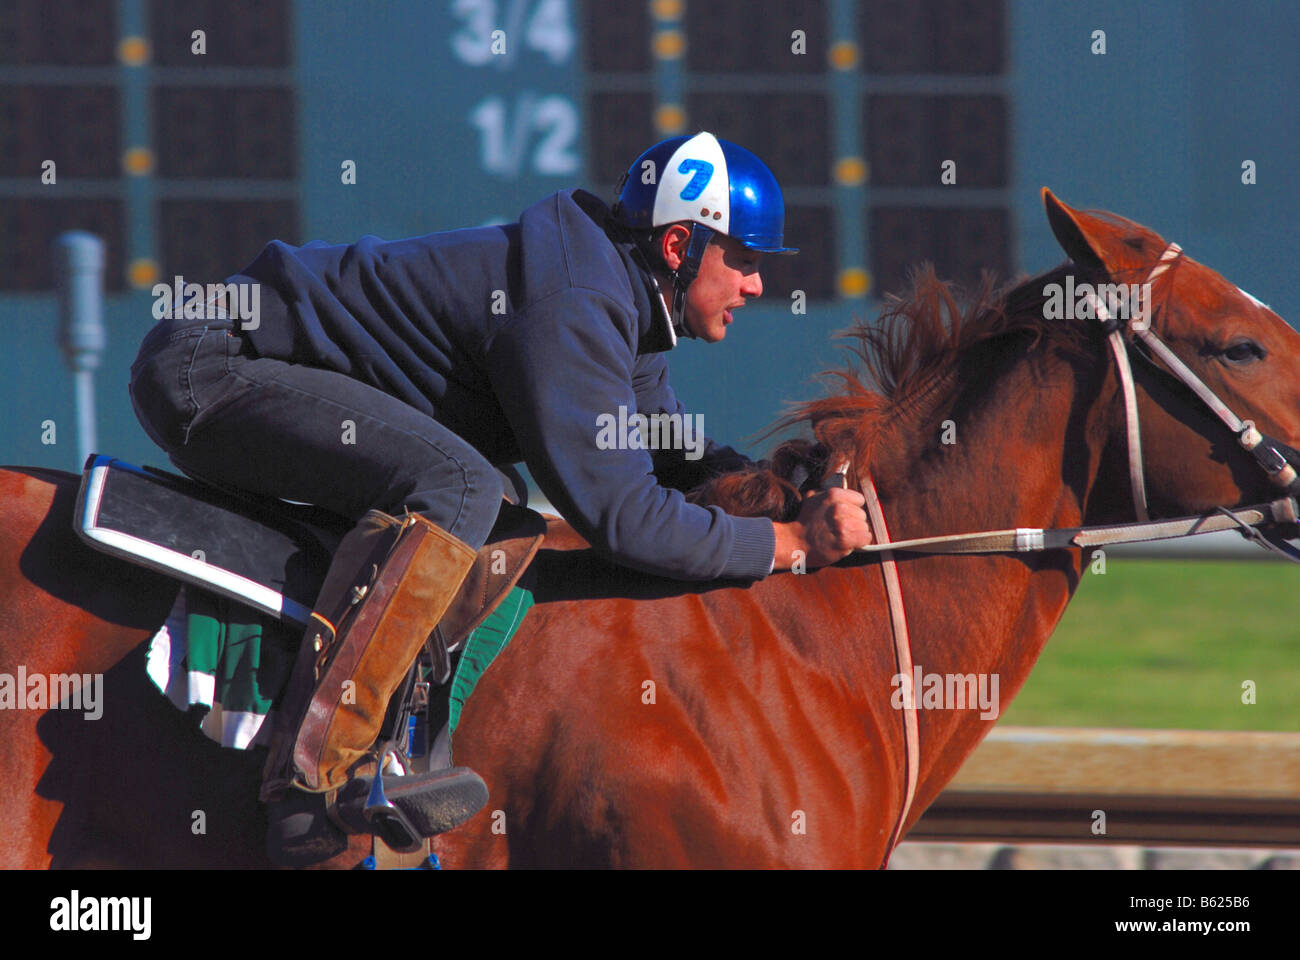 Horse racing jockey on a horse racing on an American race track Stock Photo